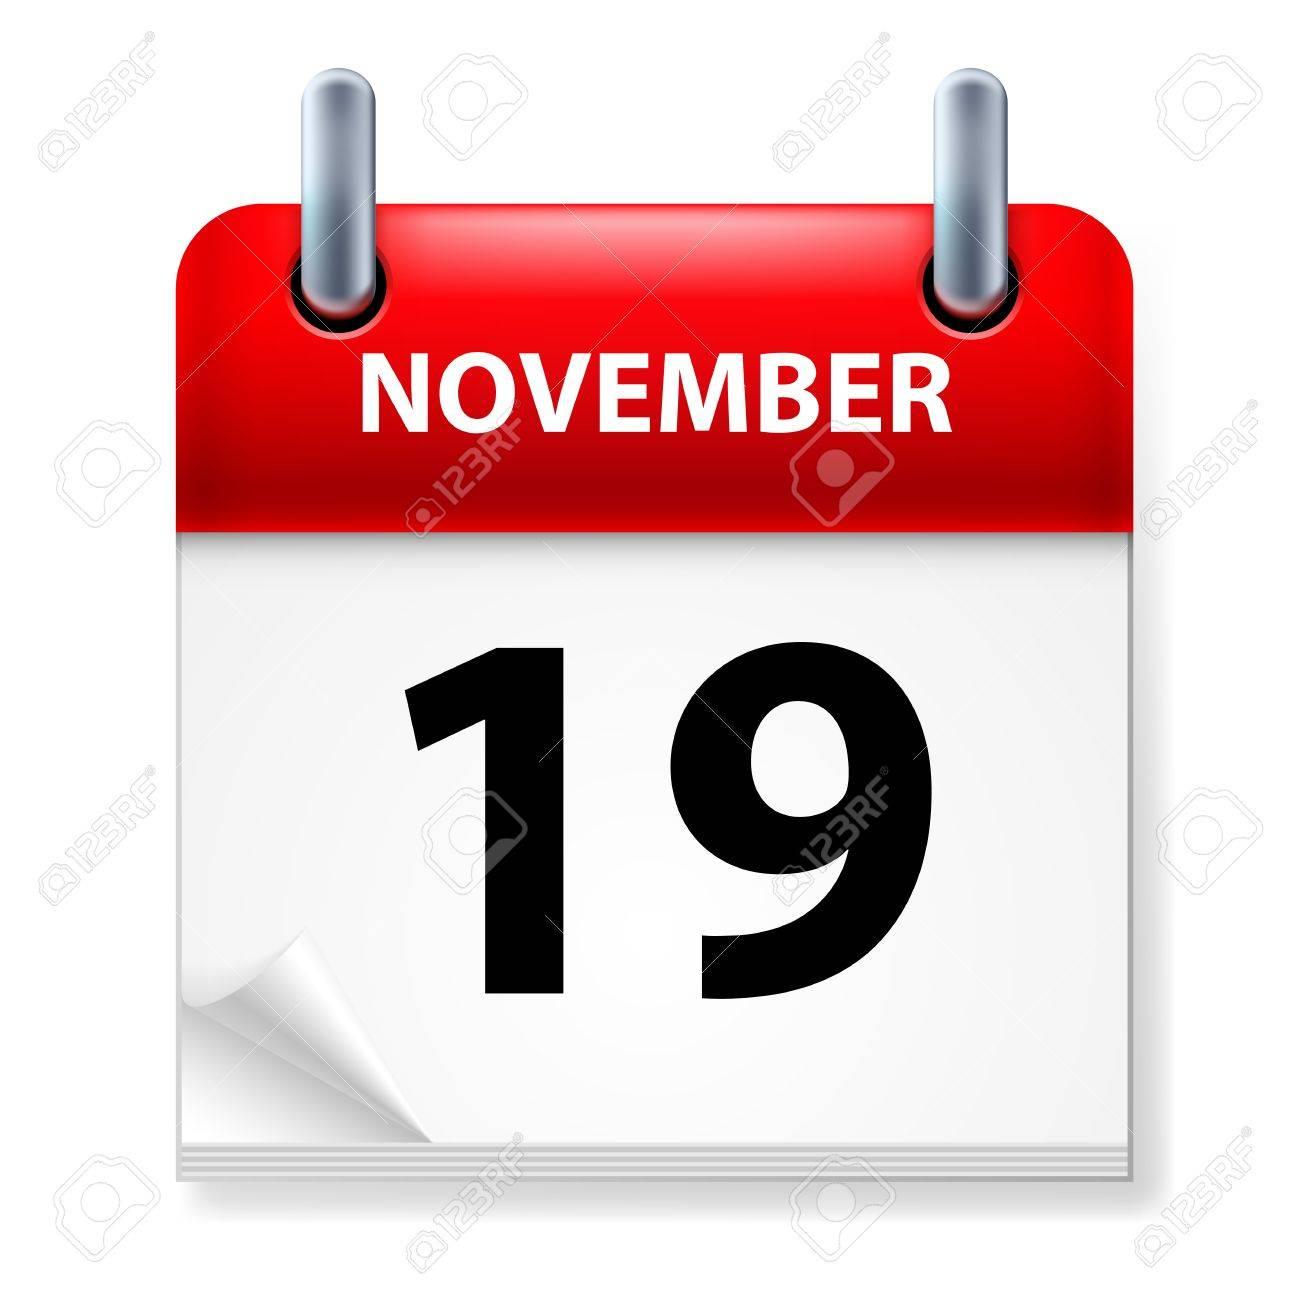 Nineteenth in November Calendar icon on white background Stock Vector - 14496315